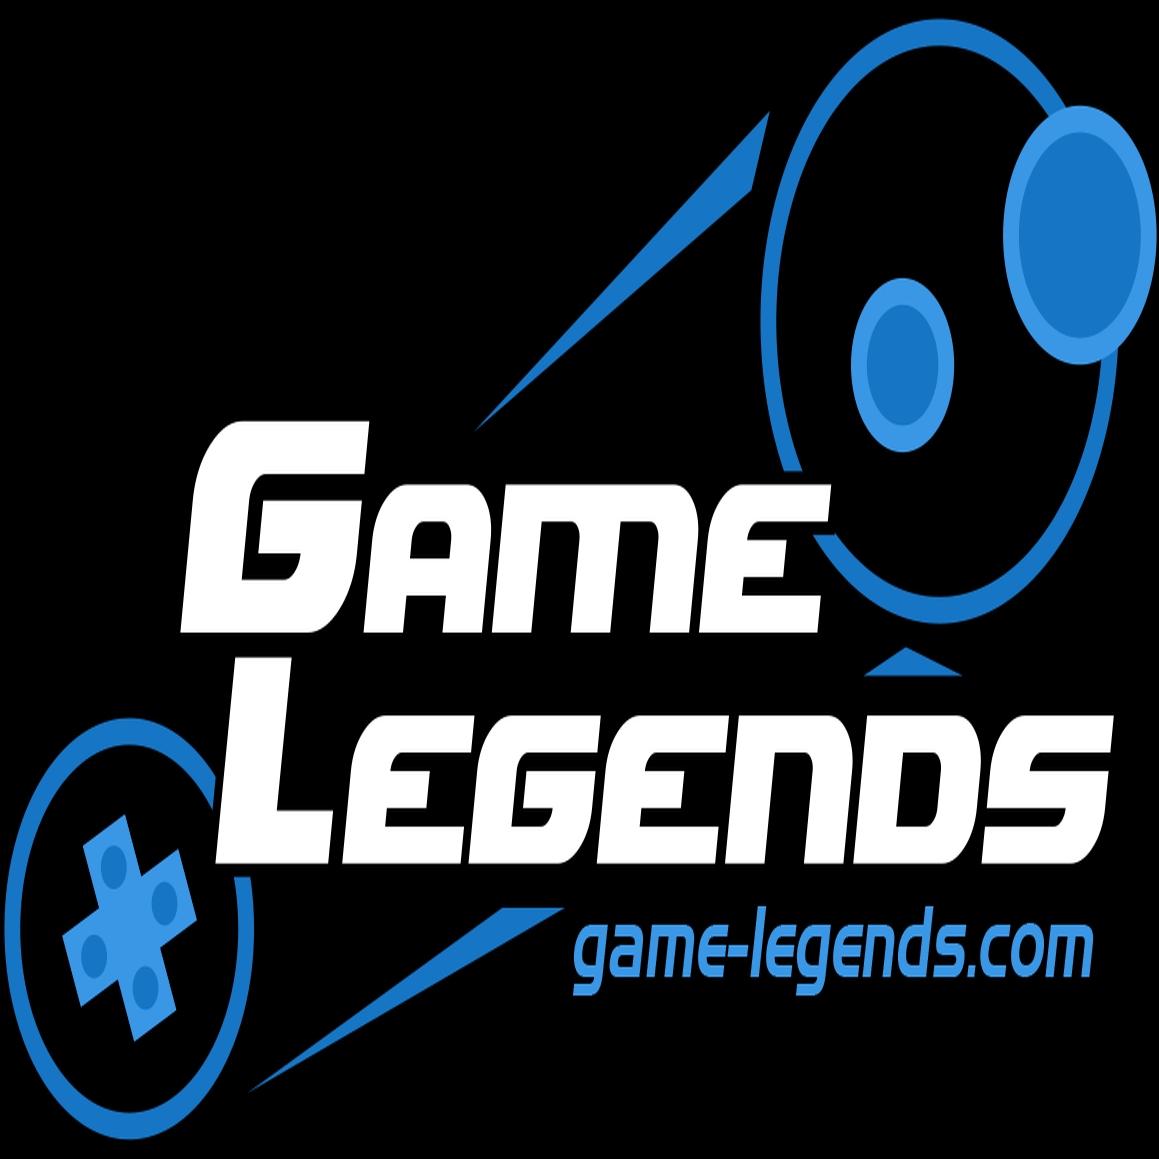 10% Discount Voucher @ Game-Legends